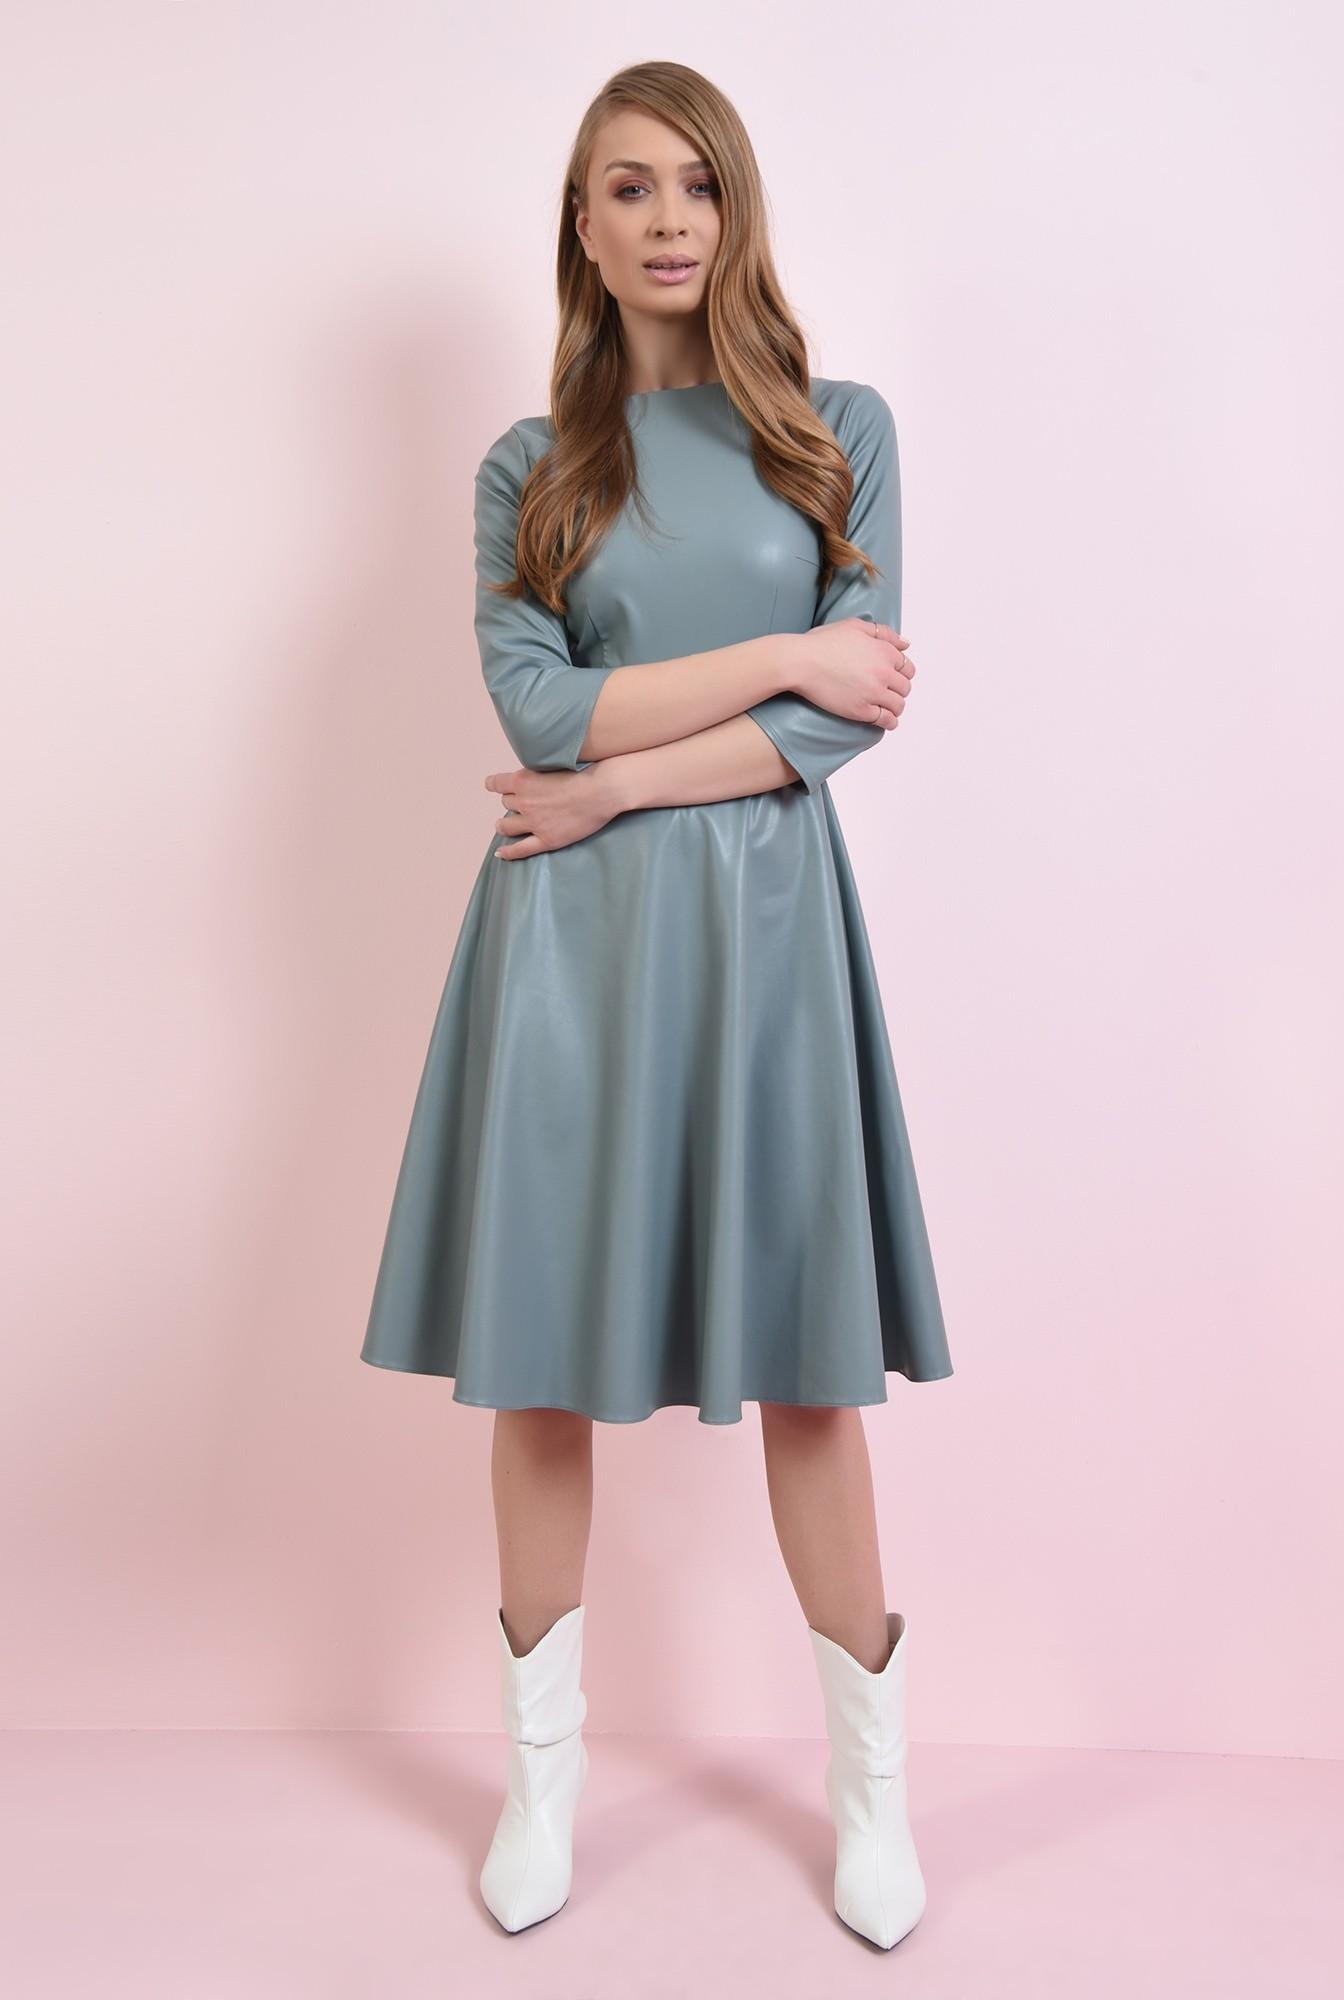 0 - rochie casual, albastra, cu maneca 3/4